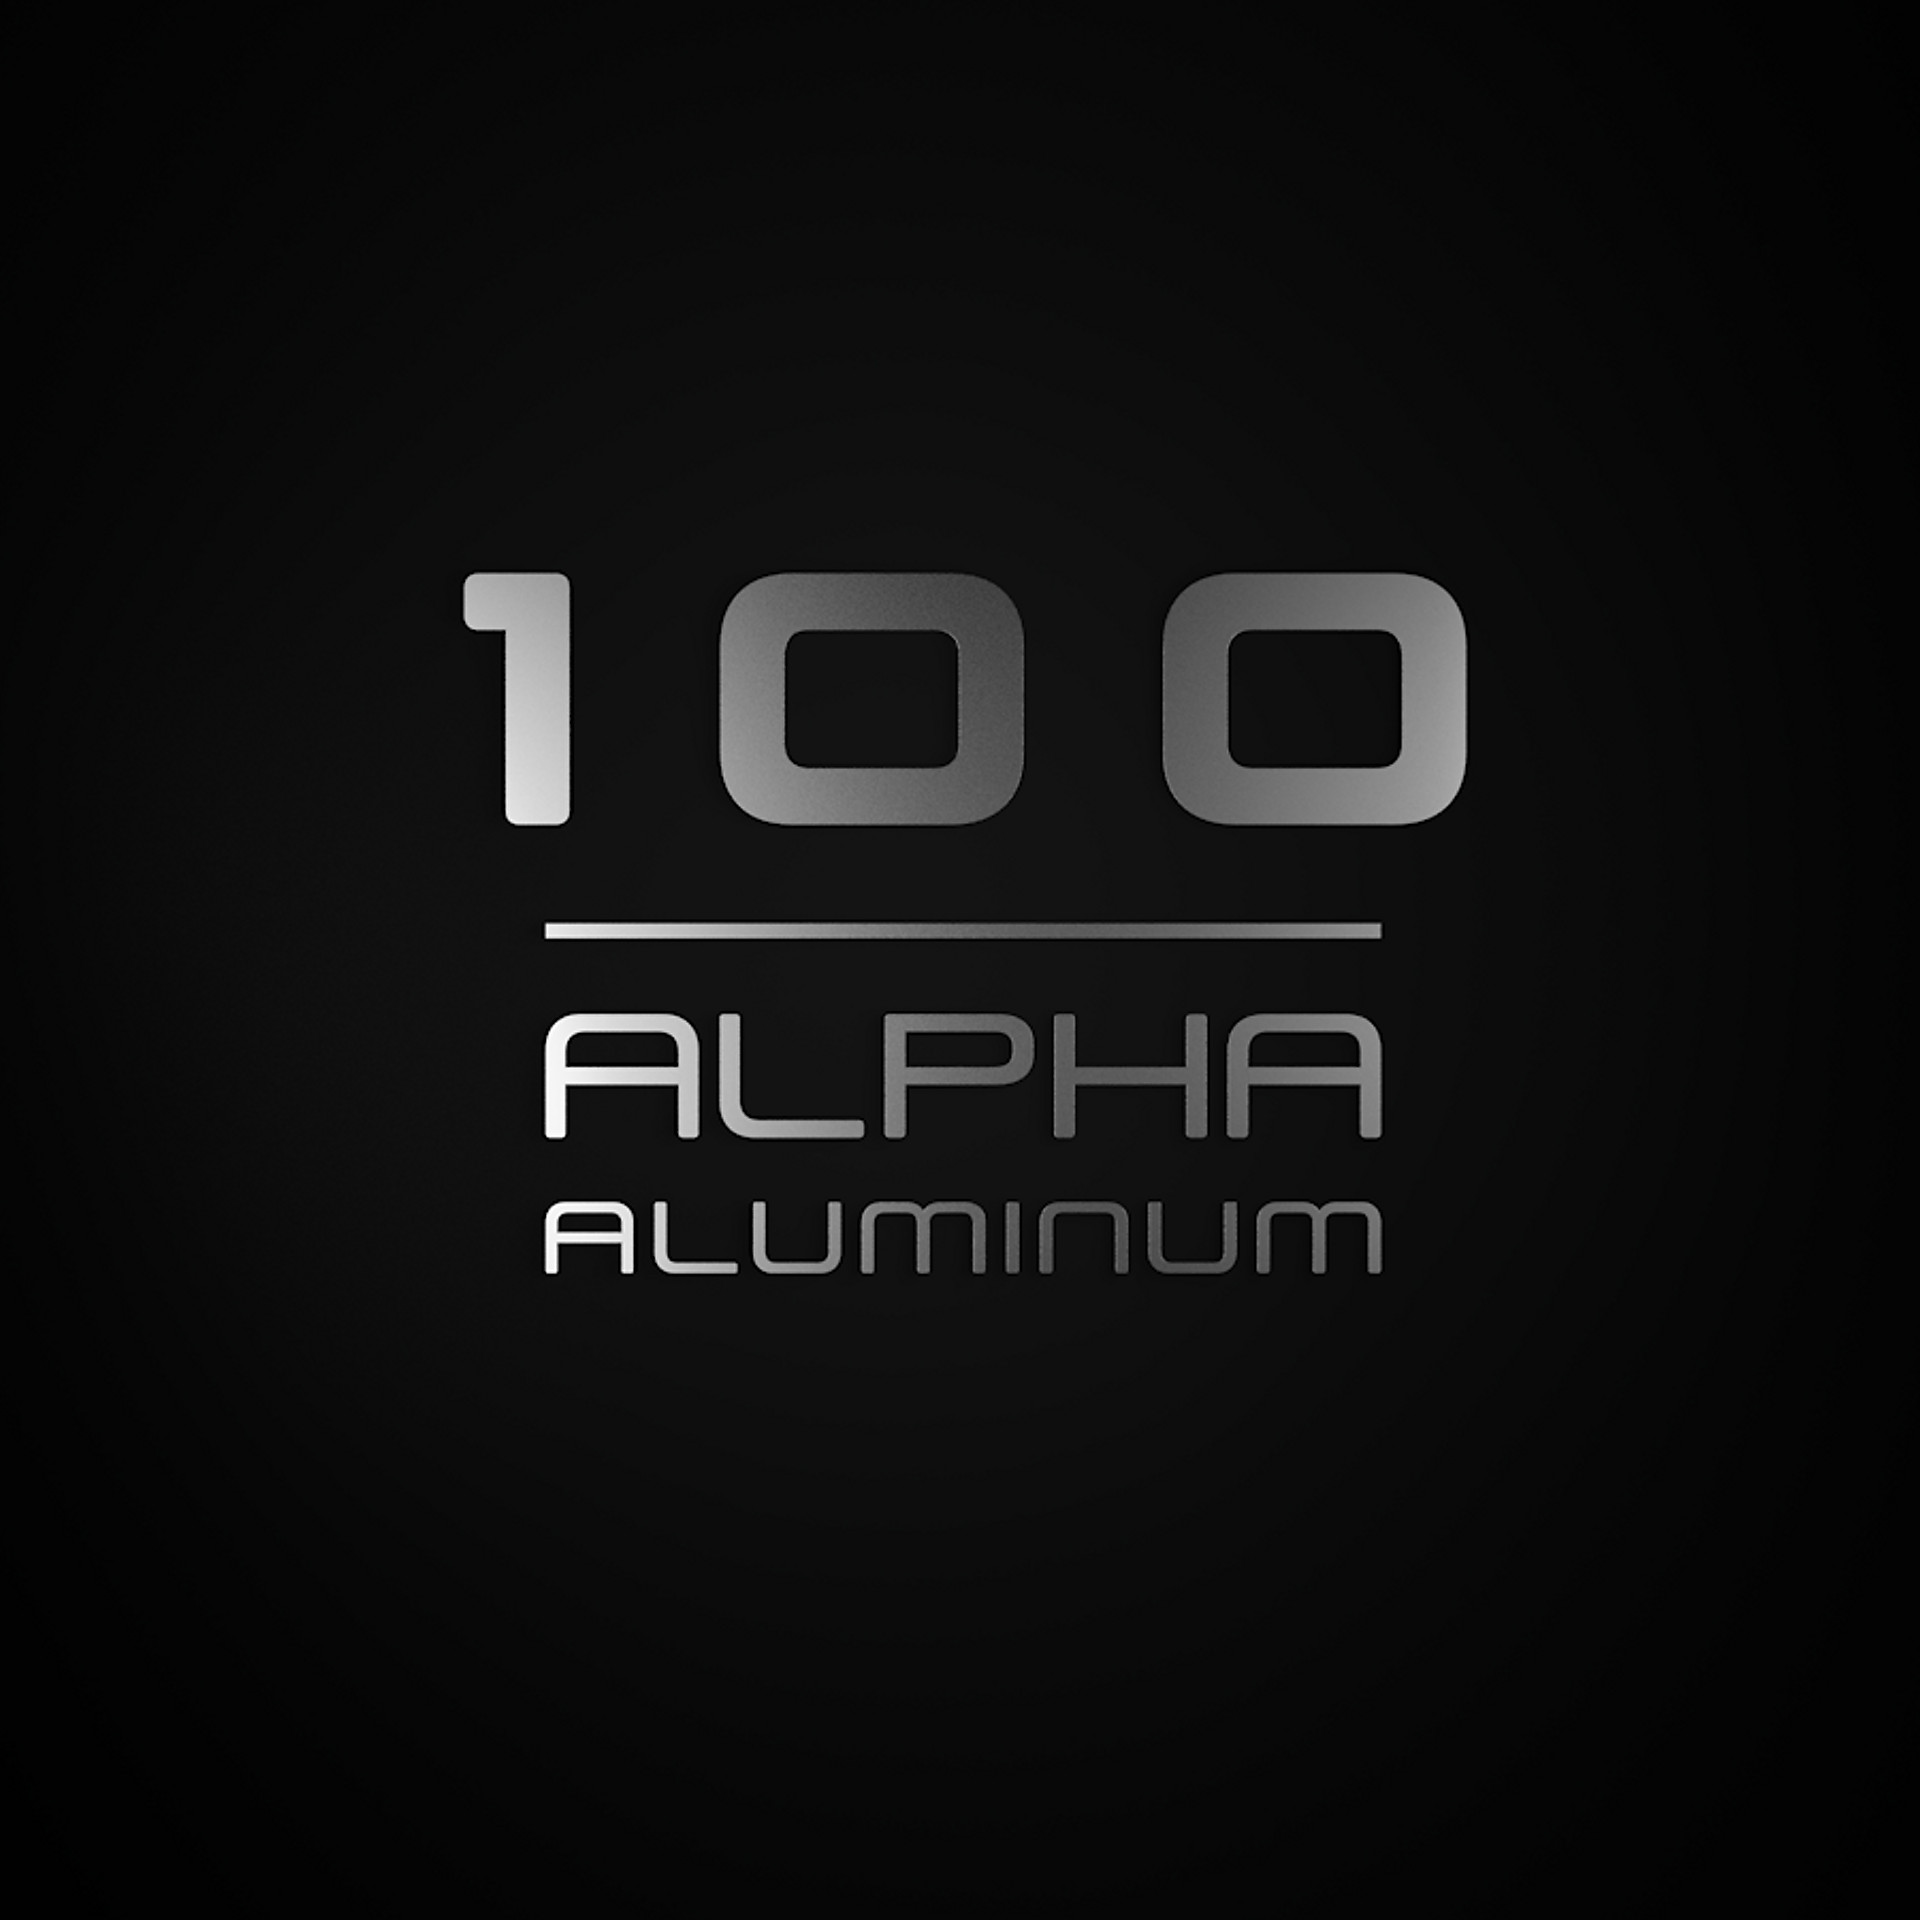 FeatureAsset_304495_100_series_alpha_alu